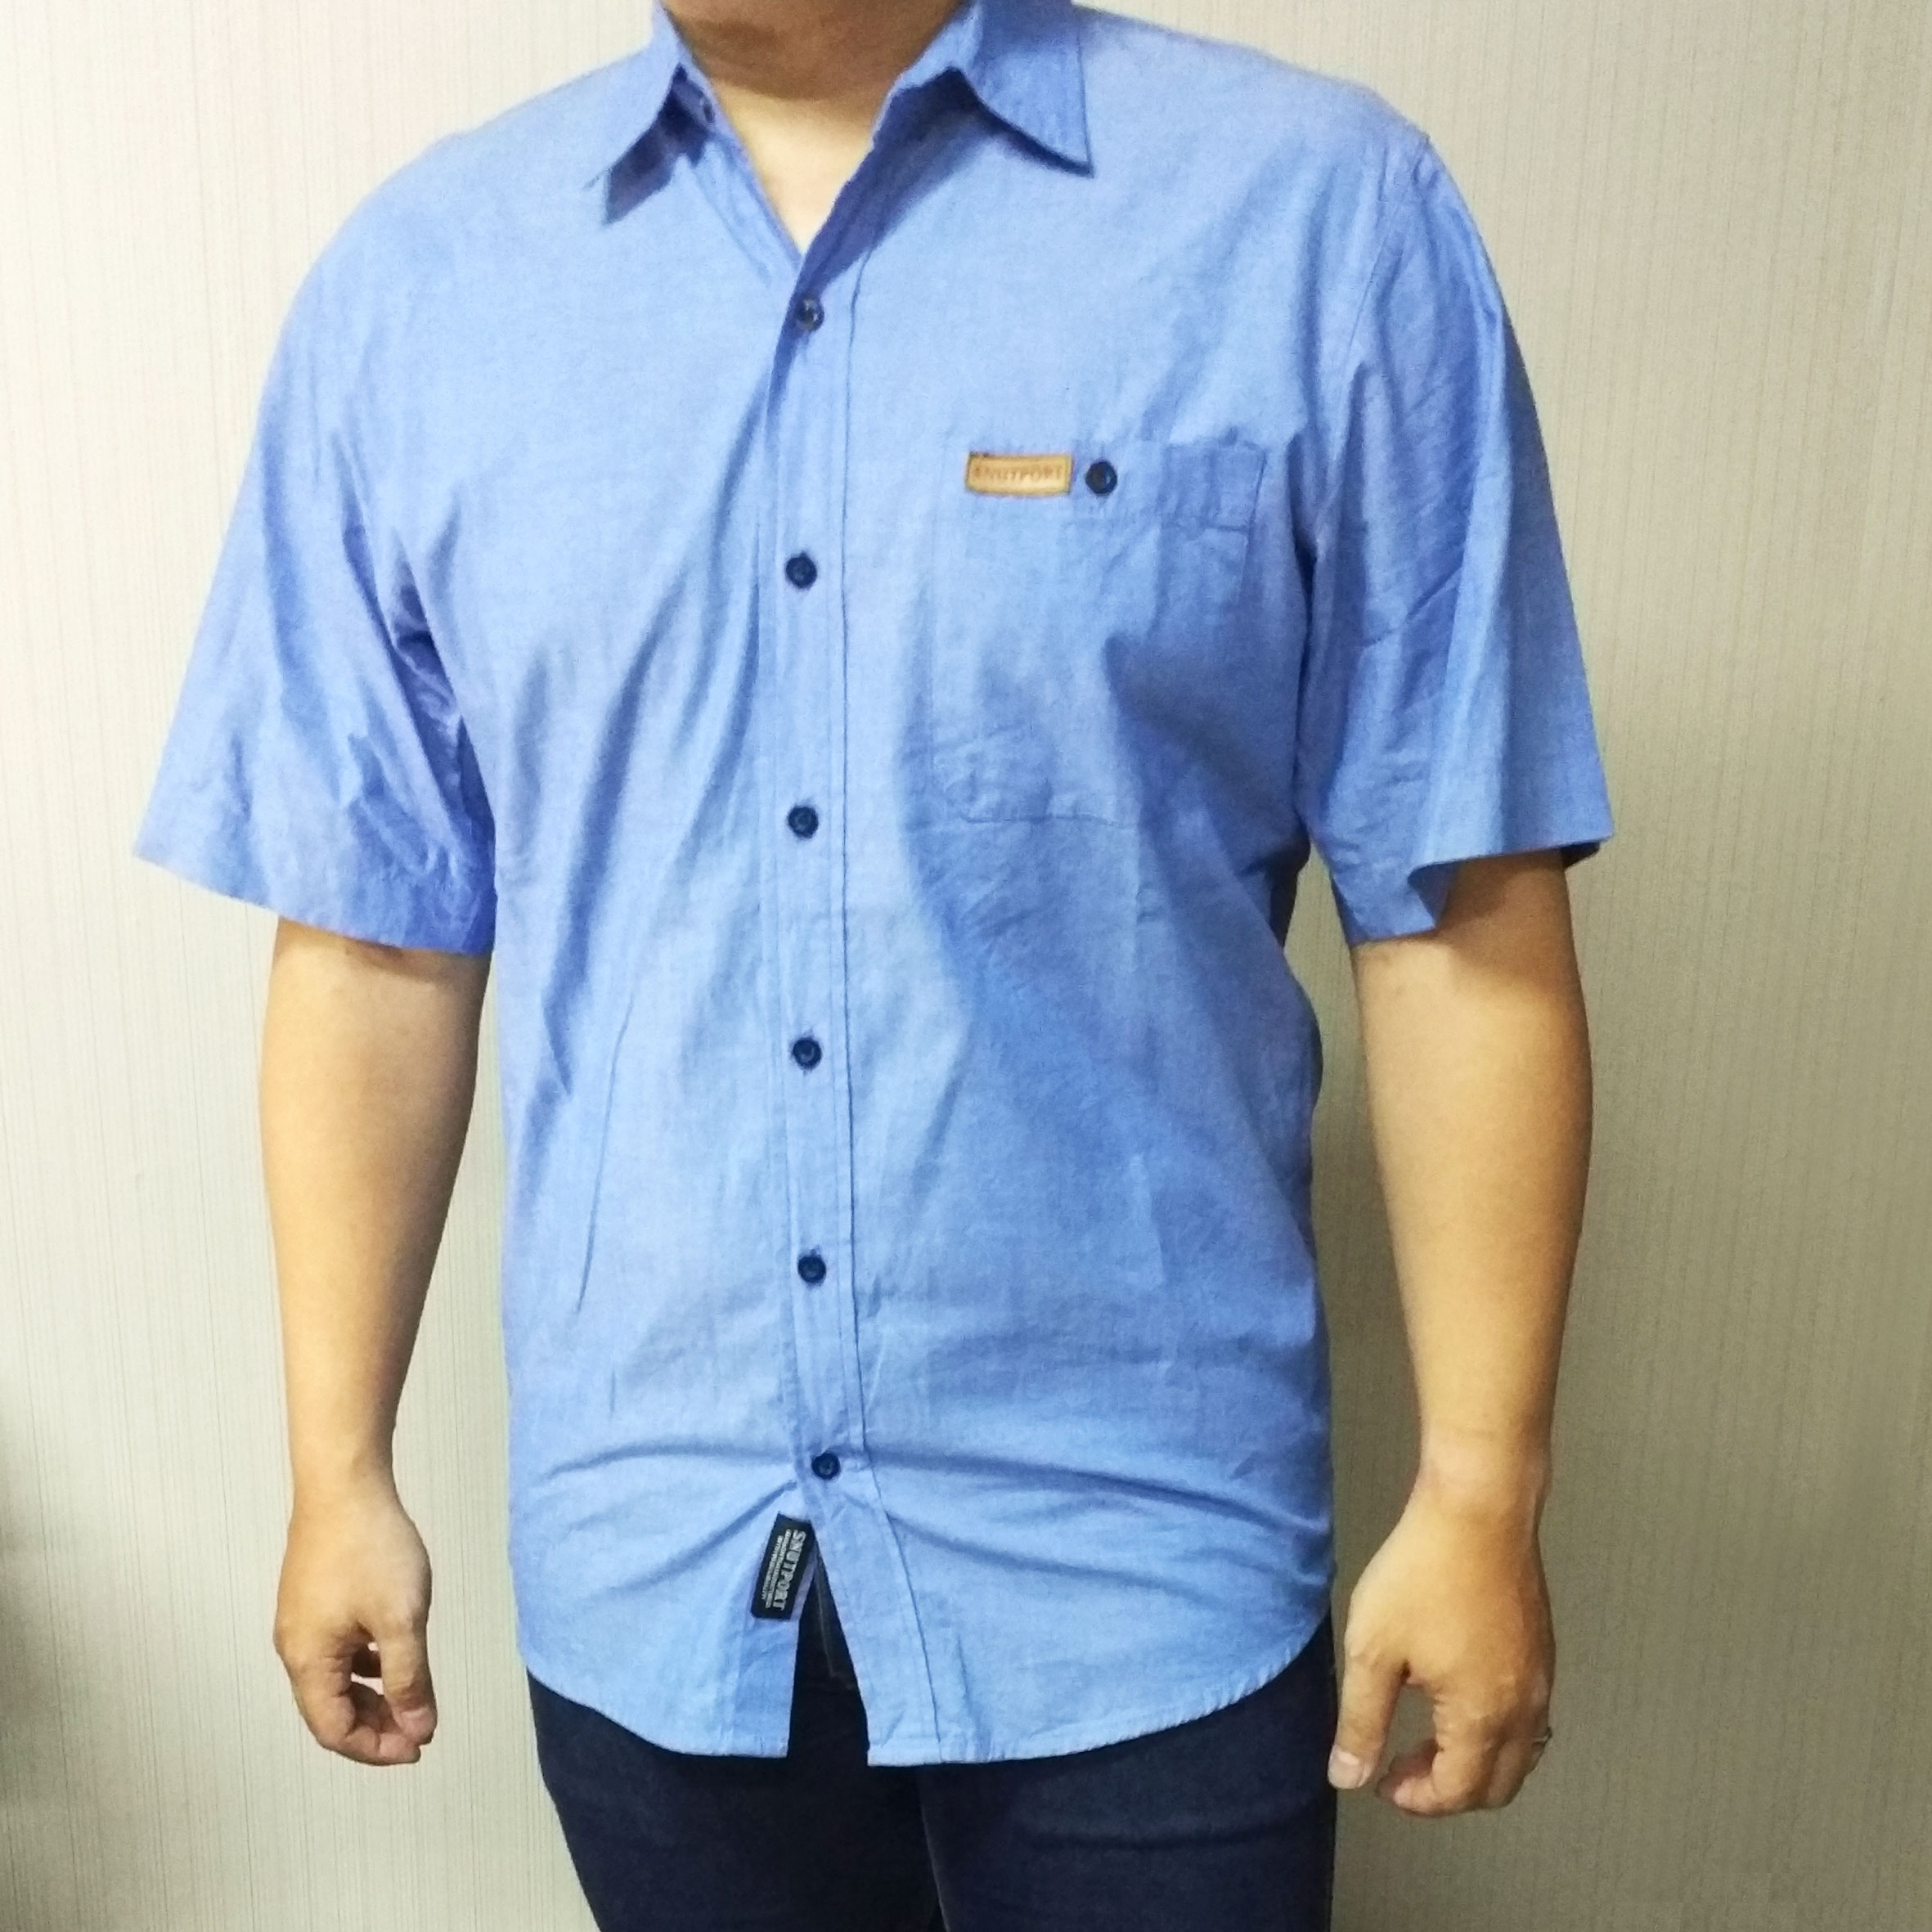 Snutport Blue Shirt